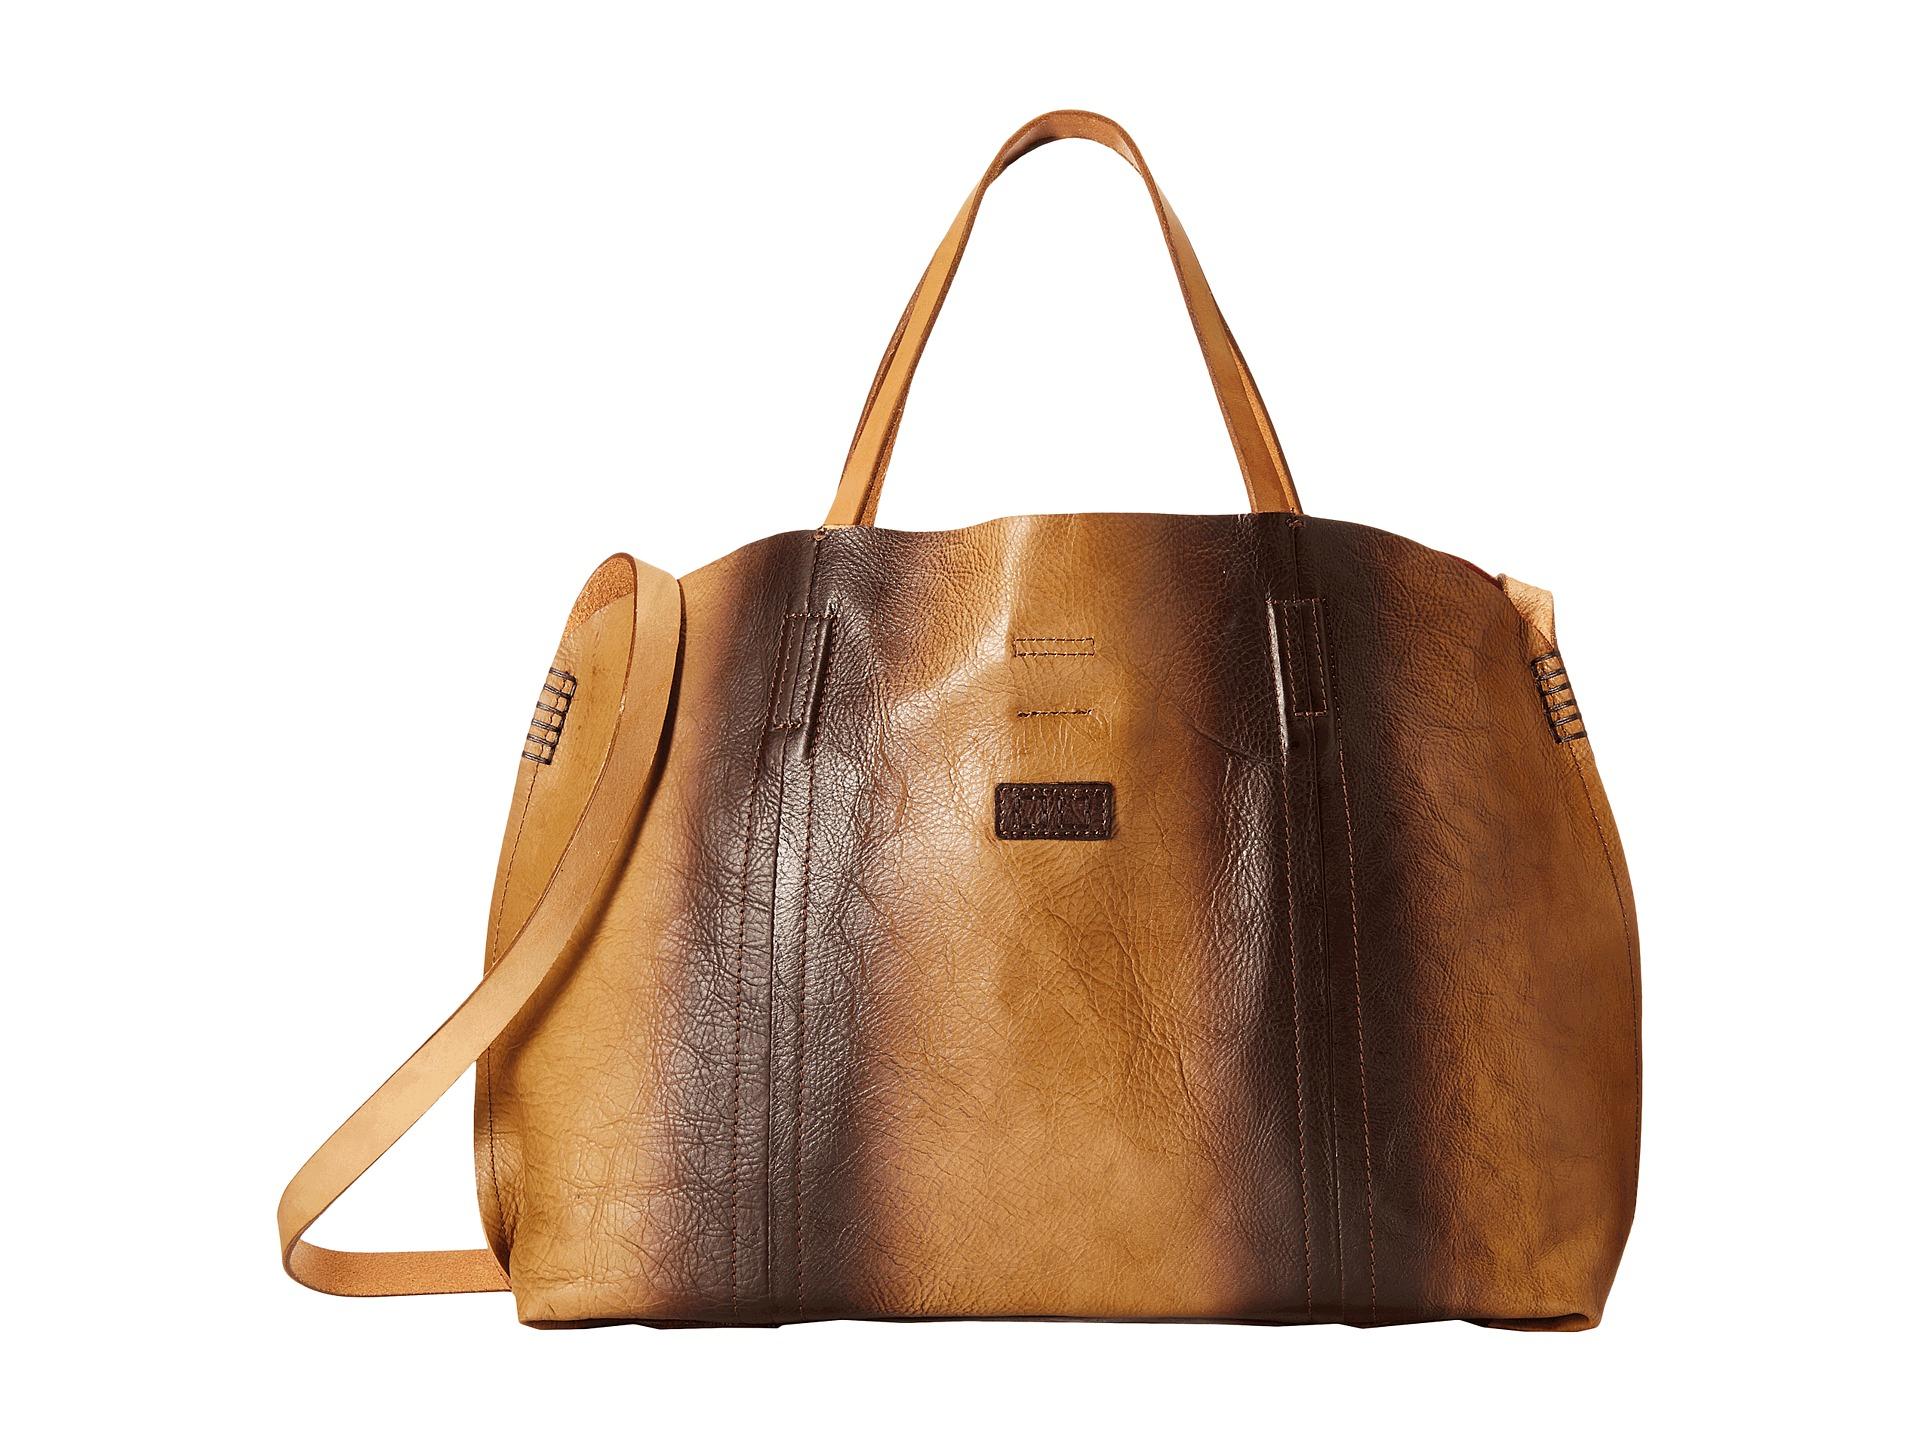 bed stu del ray bag in brown | lyst